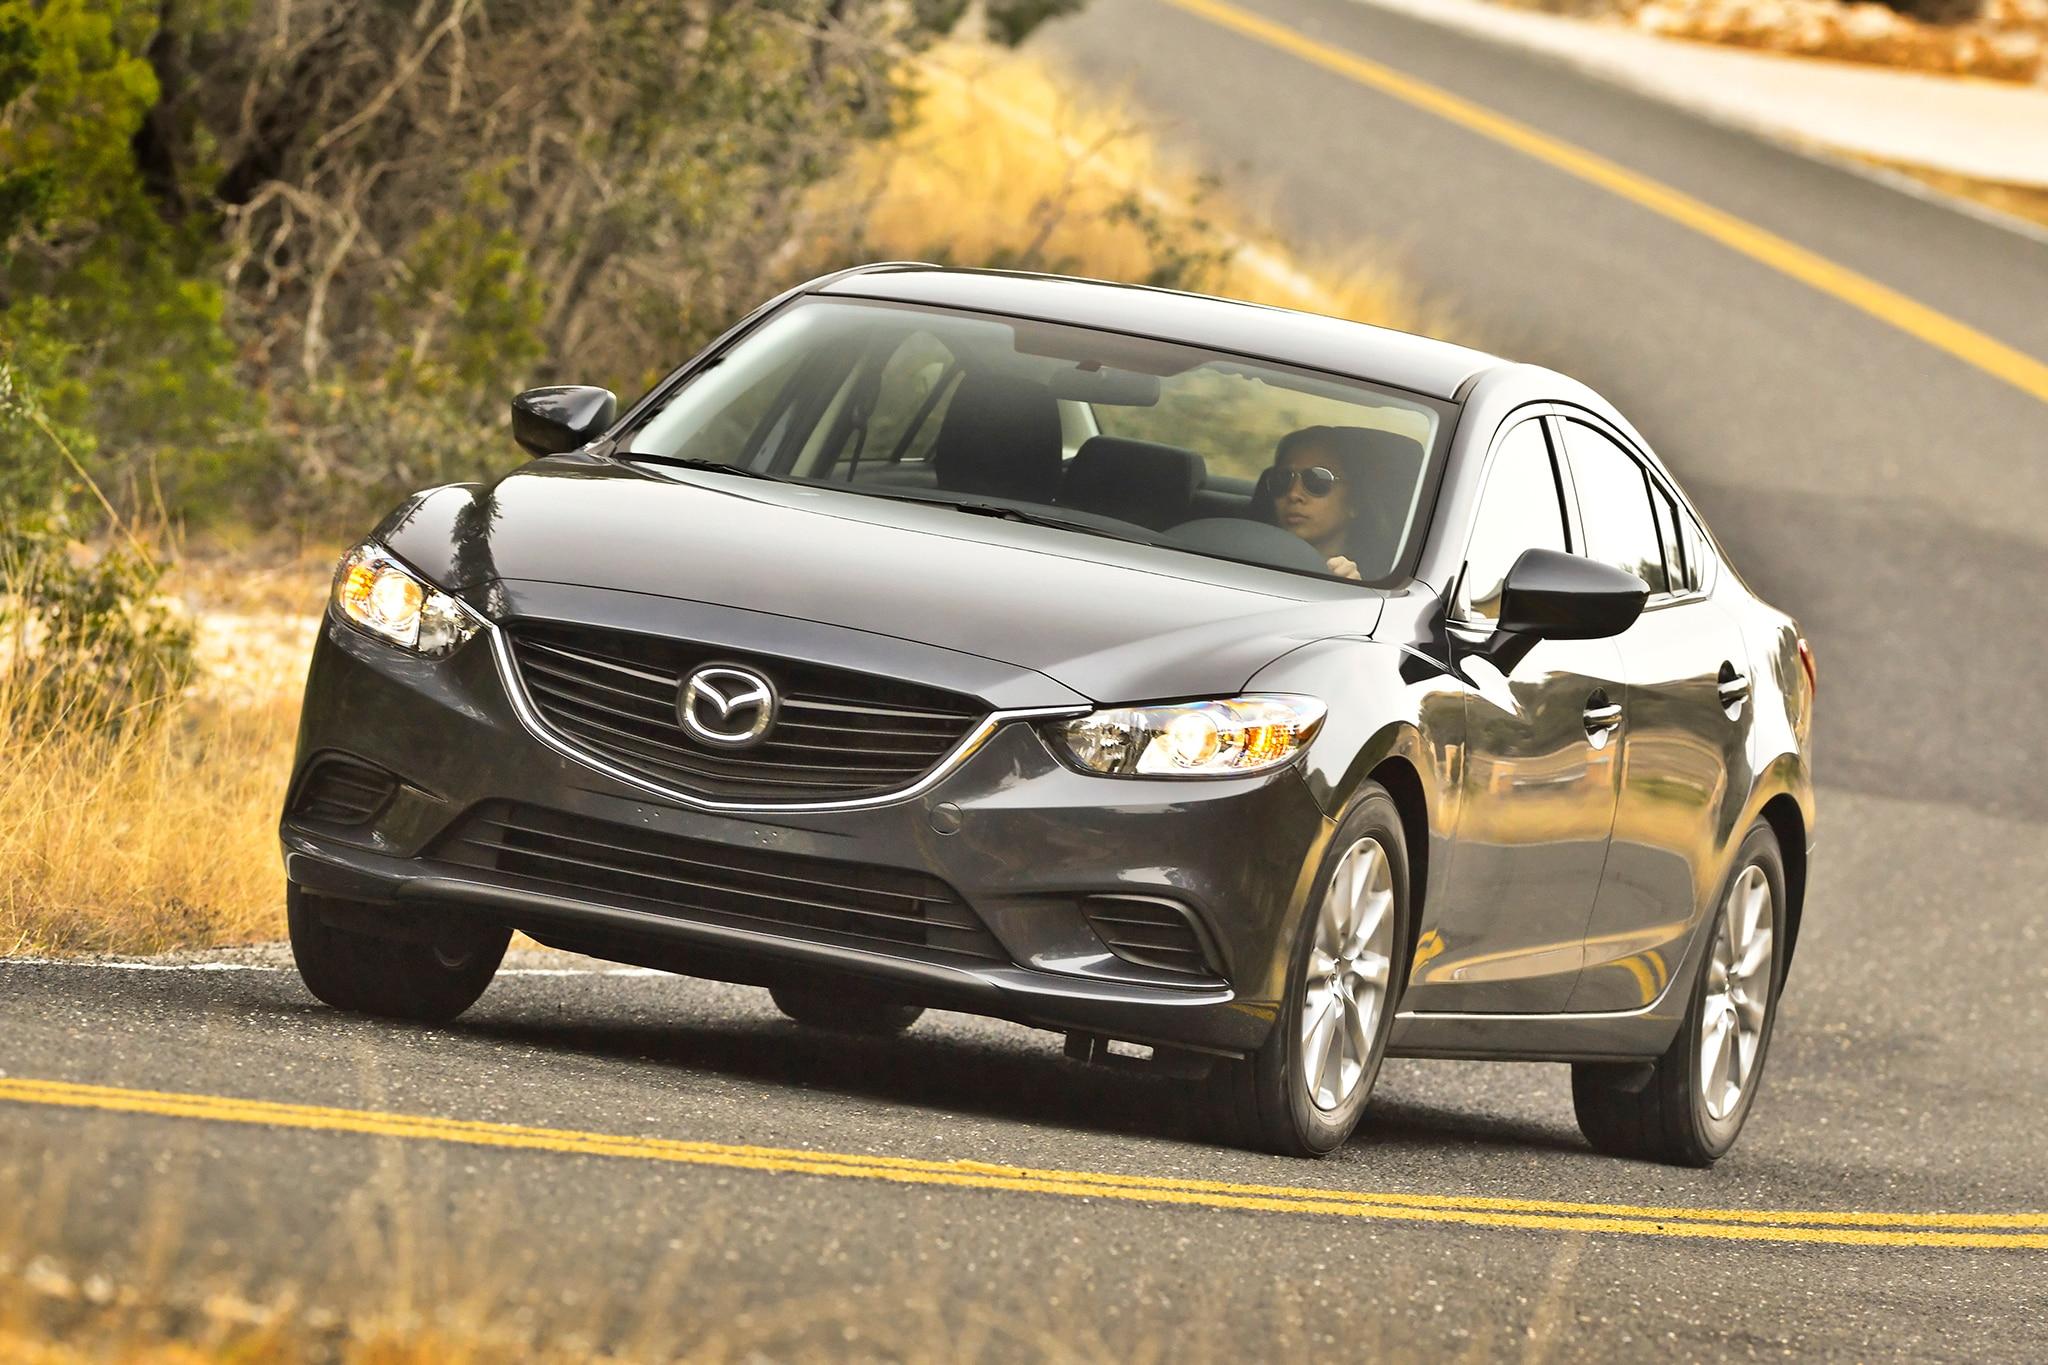 2014 Mazda6 Sport Front Three Quarters View1